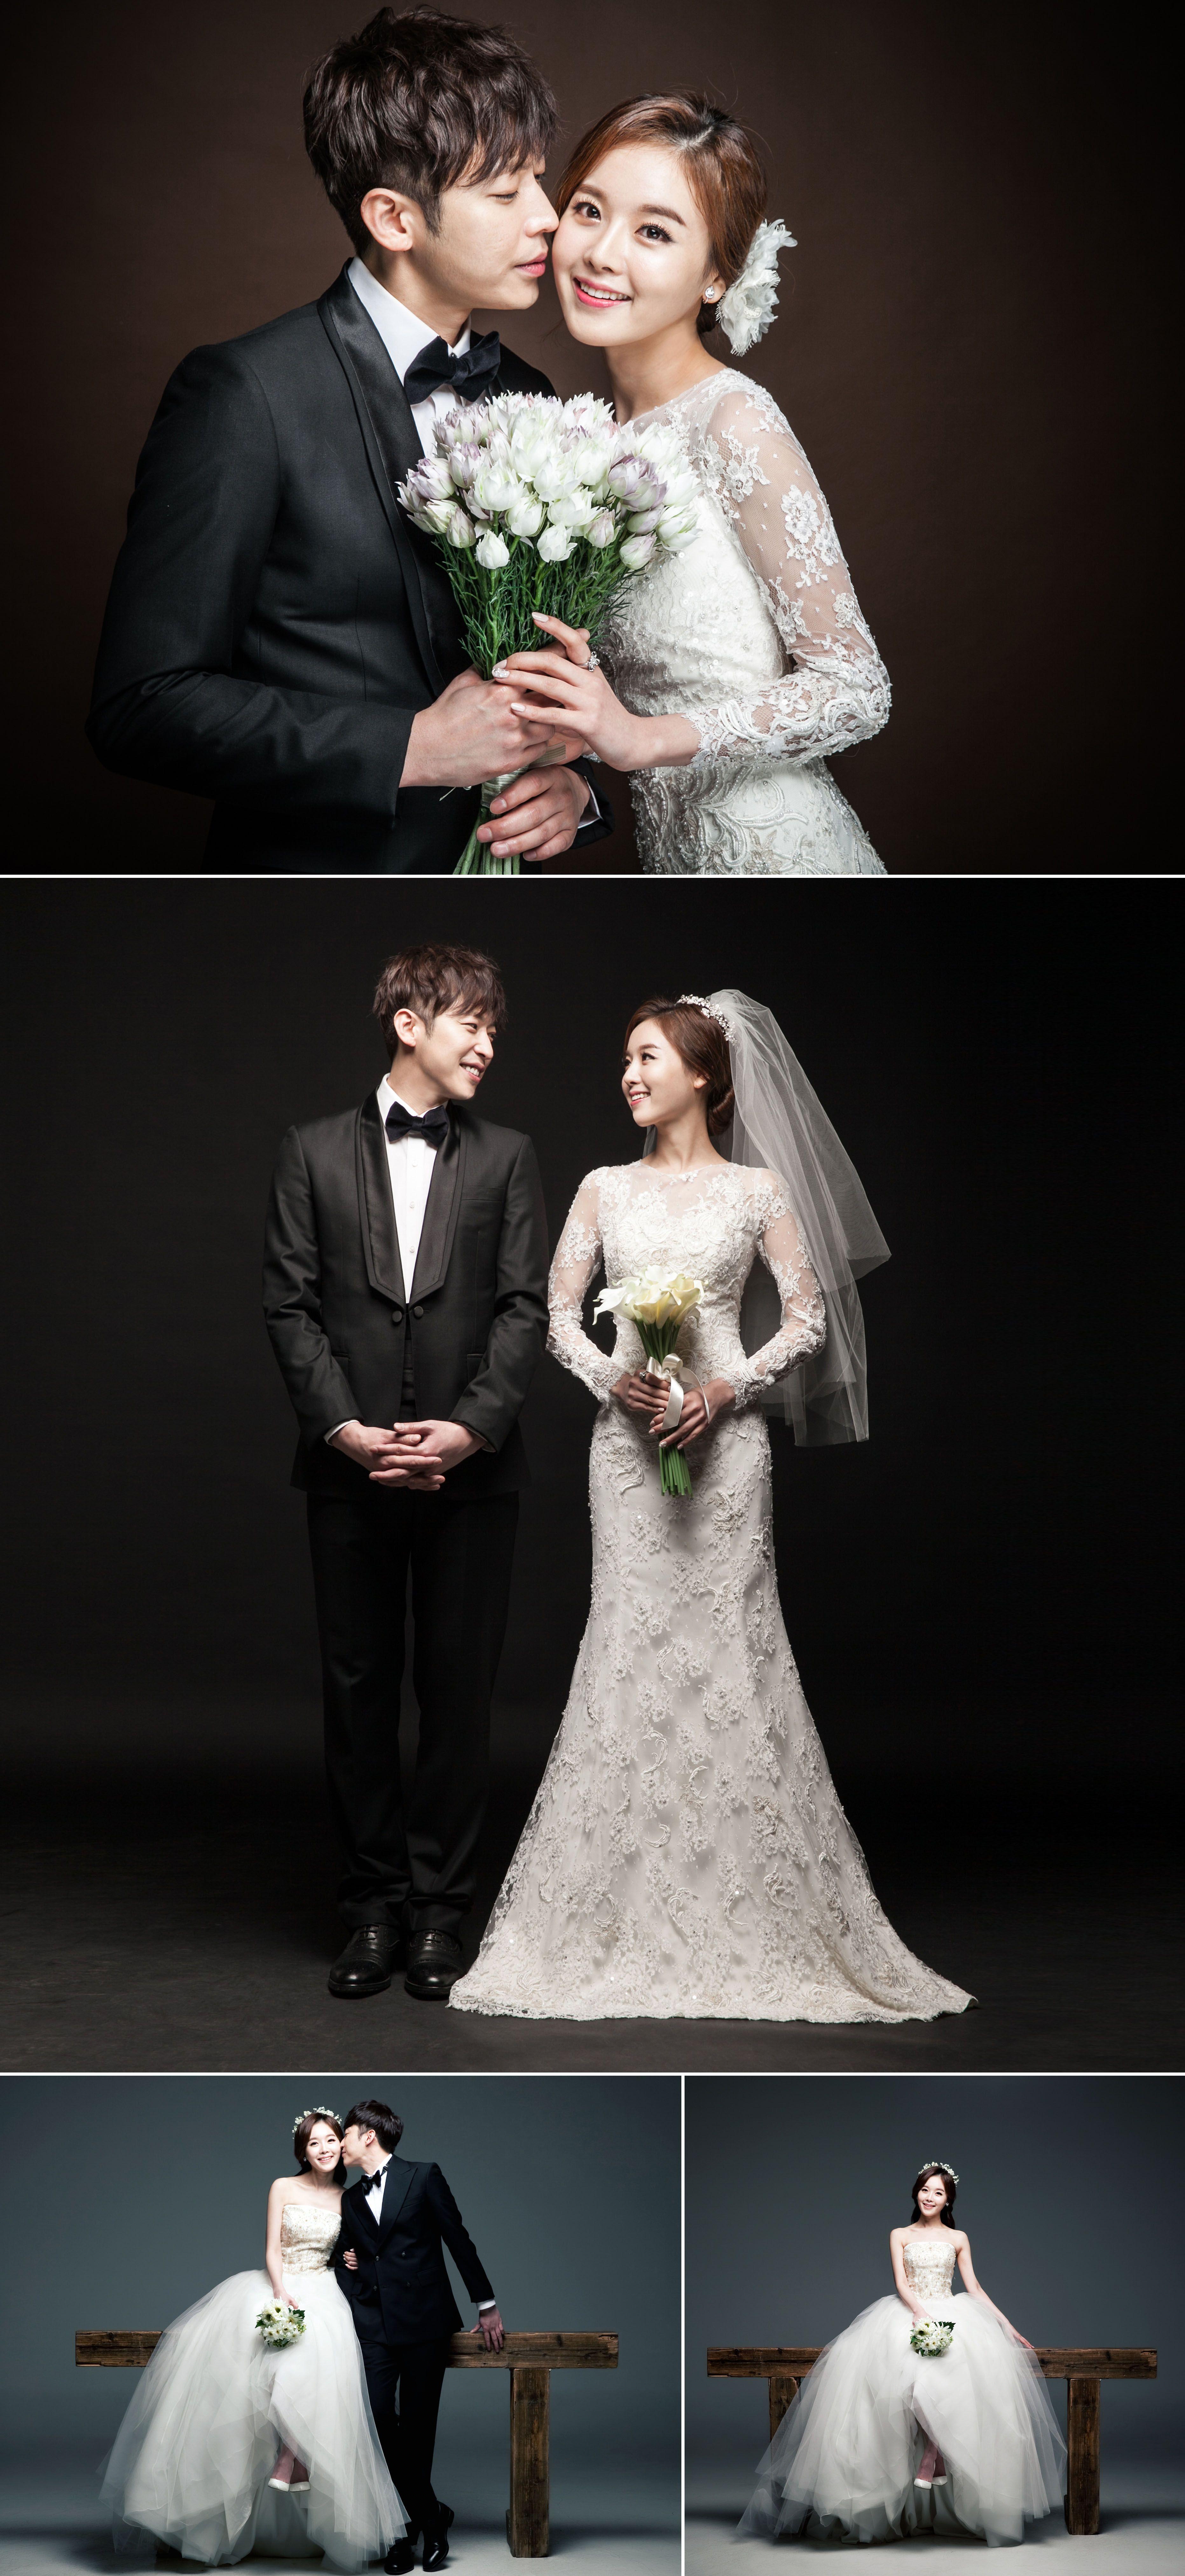 Wallpaper diy pre wedding of desktop full hd pics korean prewedding photography concepts